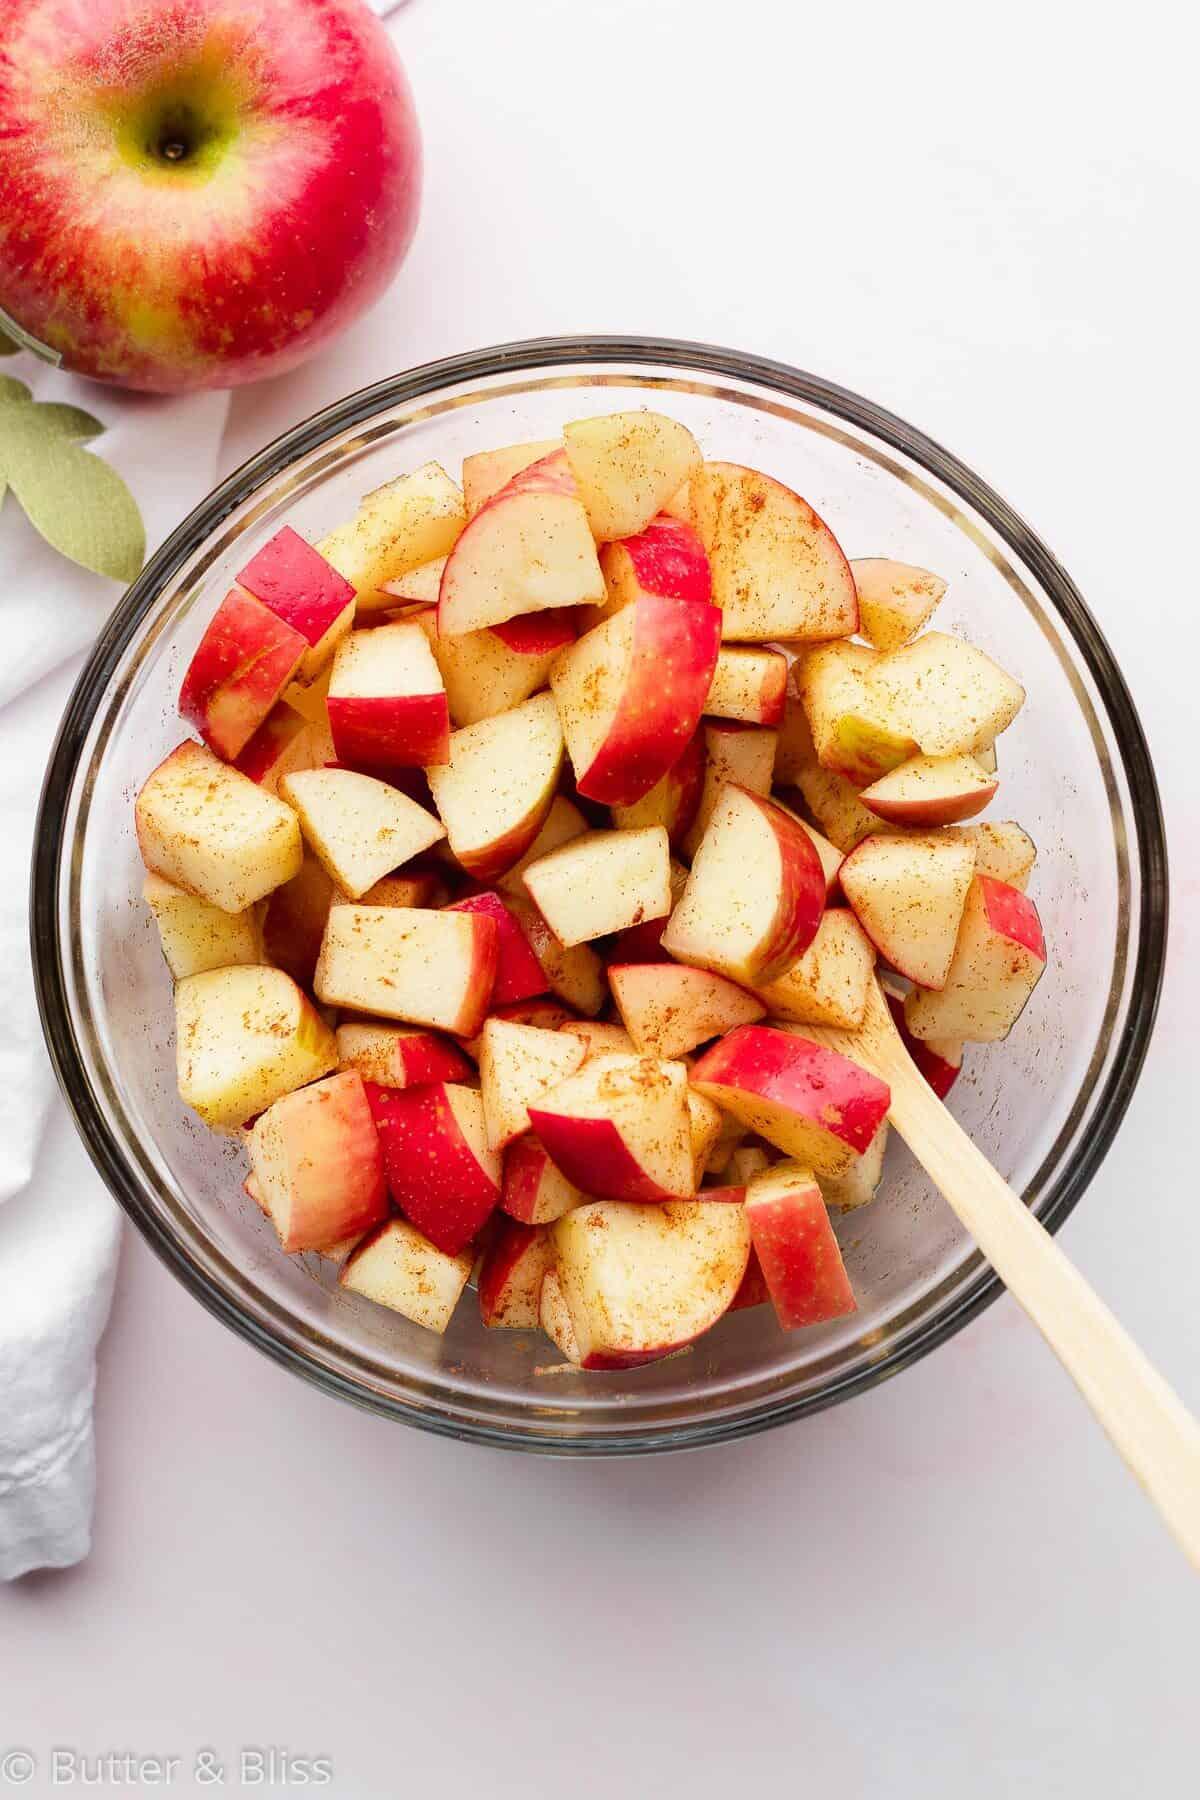 Fresh cut apples in a bowl